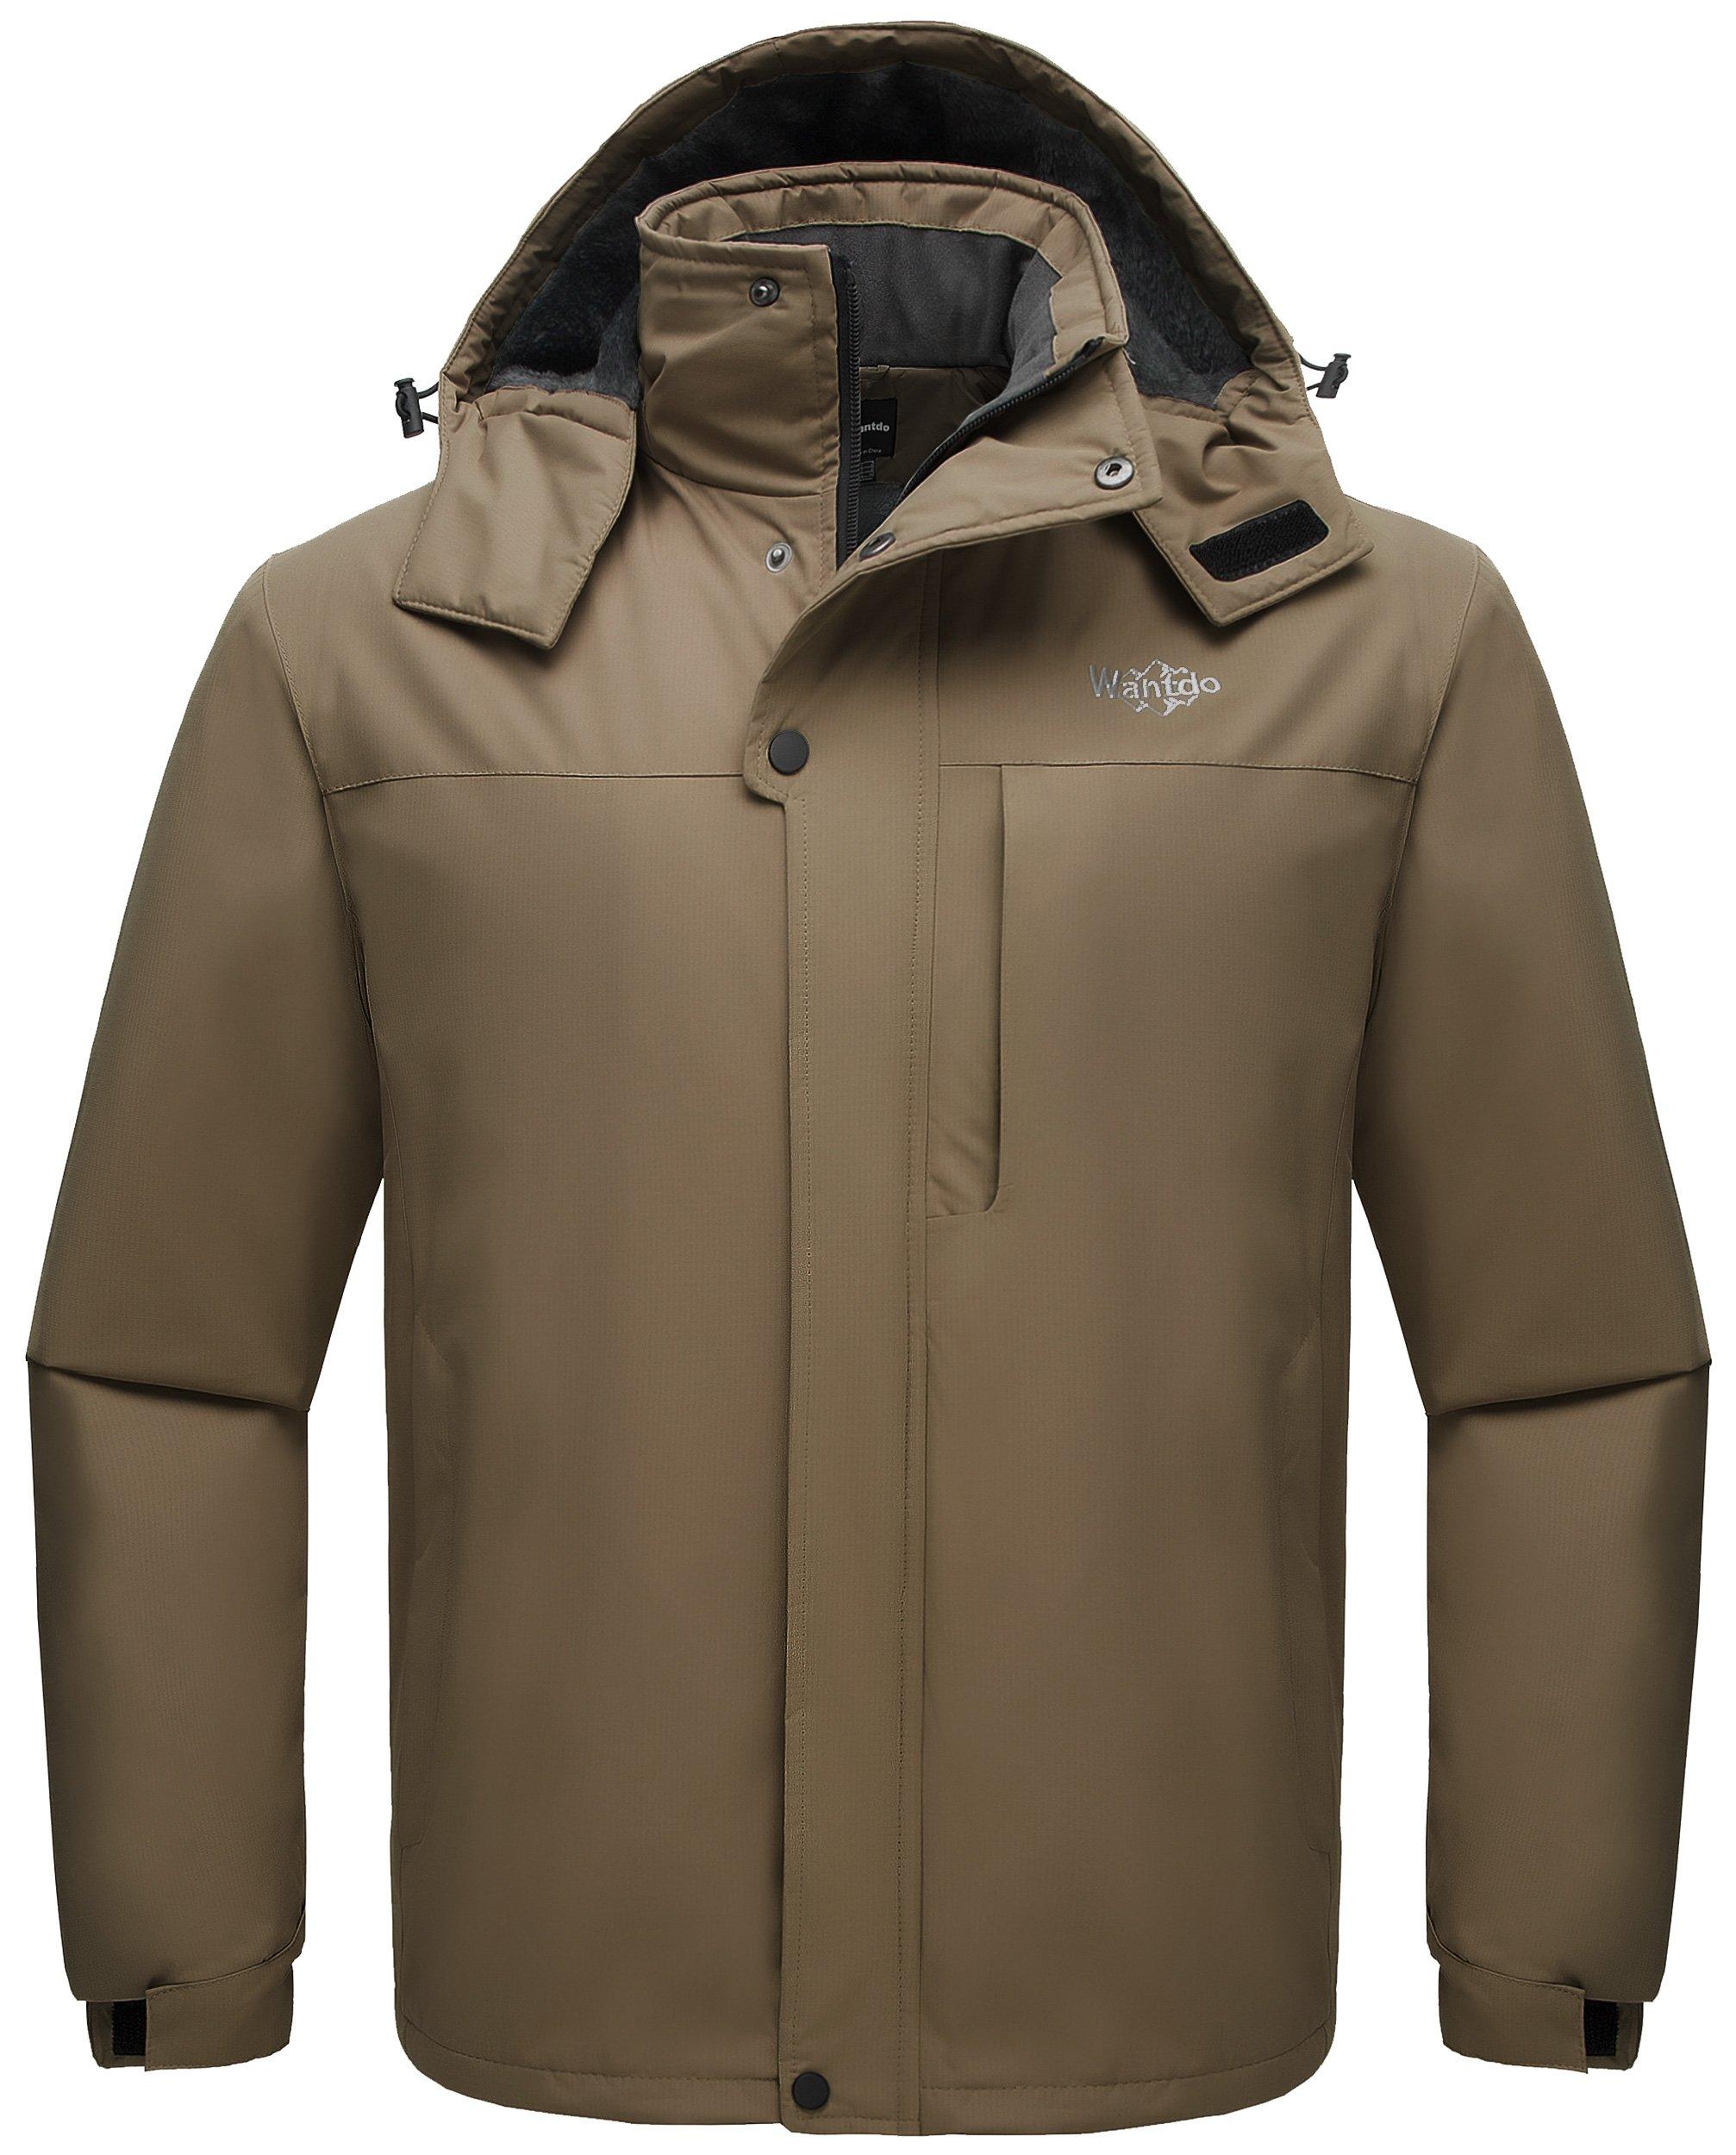 Wantdo Men's Detachable Hood Waterproof Rain Jacket Windbreak Fleece Ski Jacket Coffee US Medium